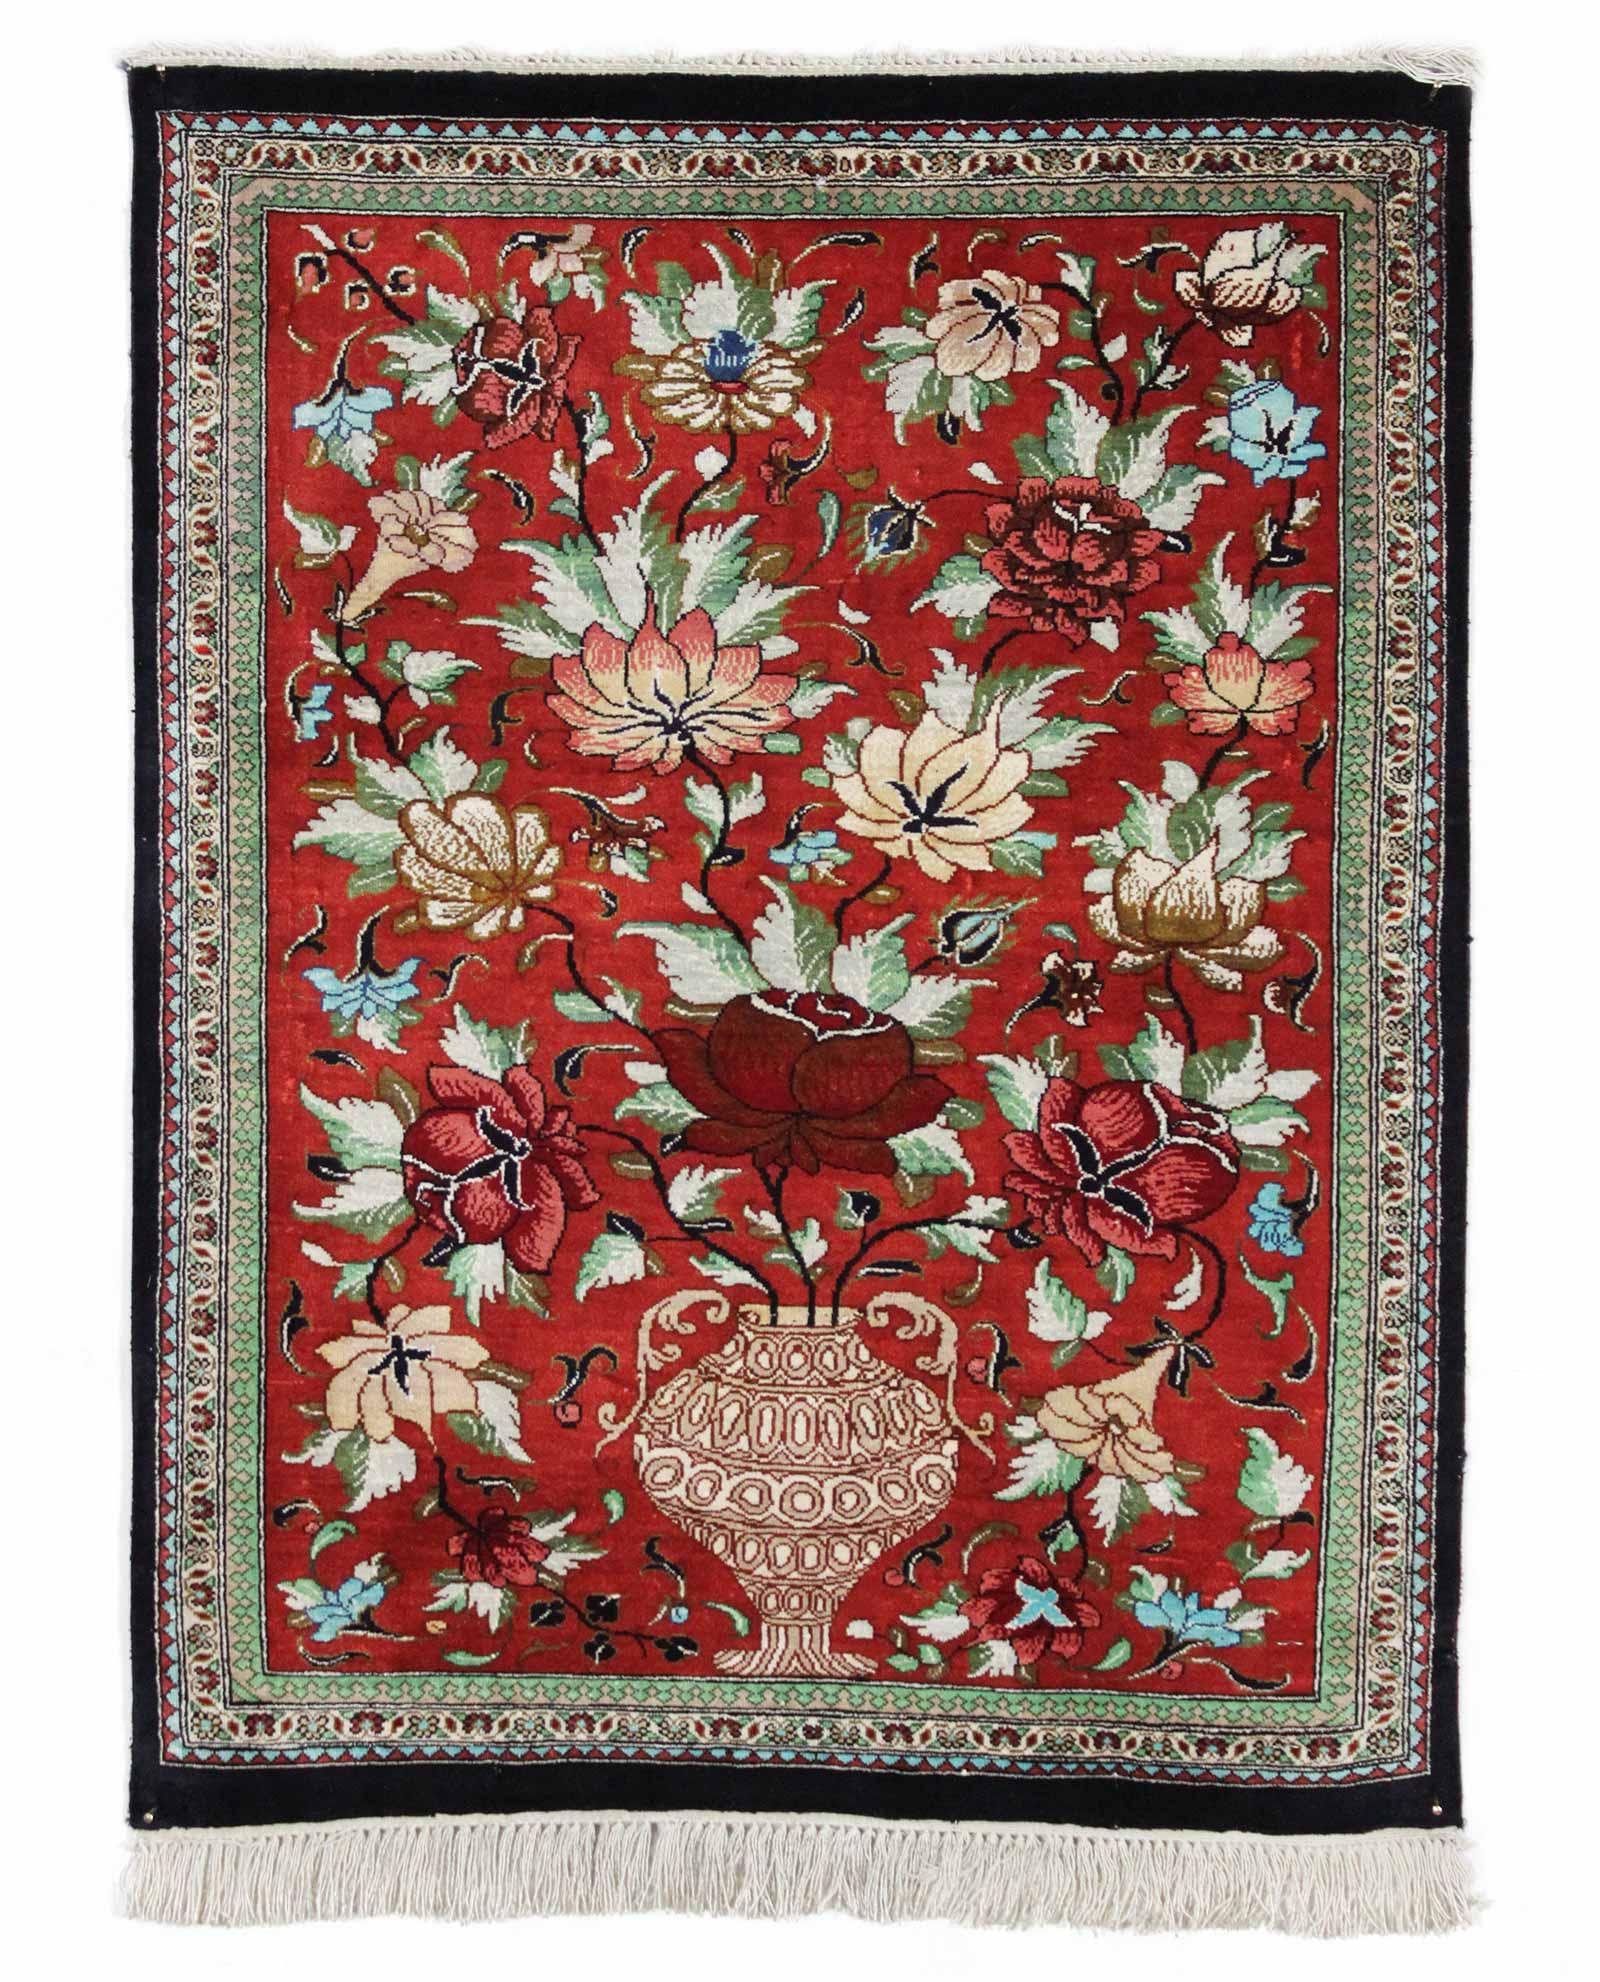 tapis persan ghom soie 14619 iranian carpet. Black Bedroom Furniture Sets. Home Design Ideas